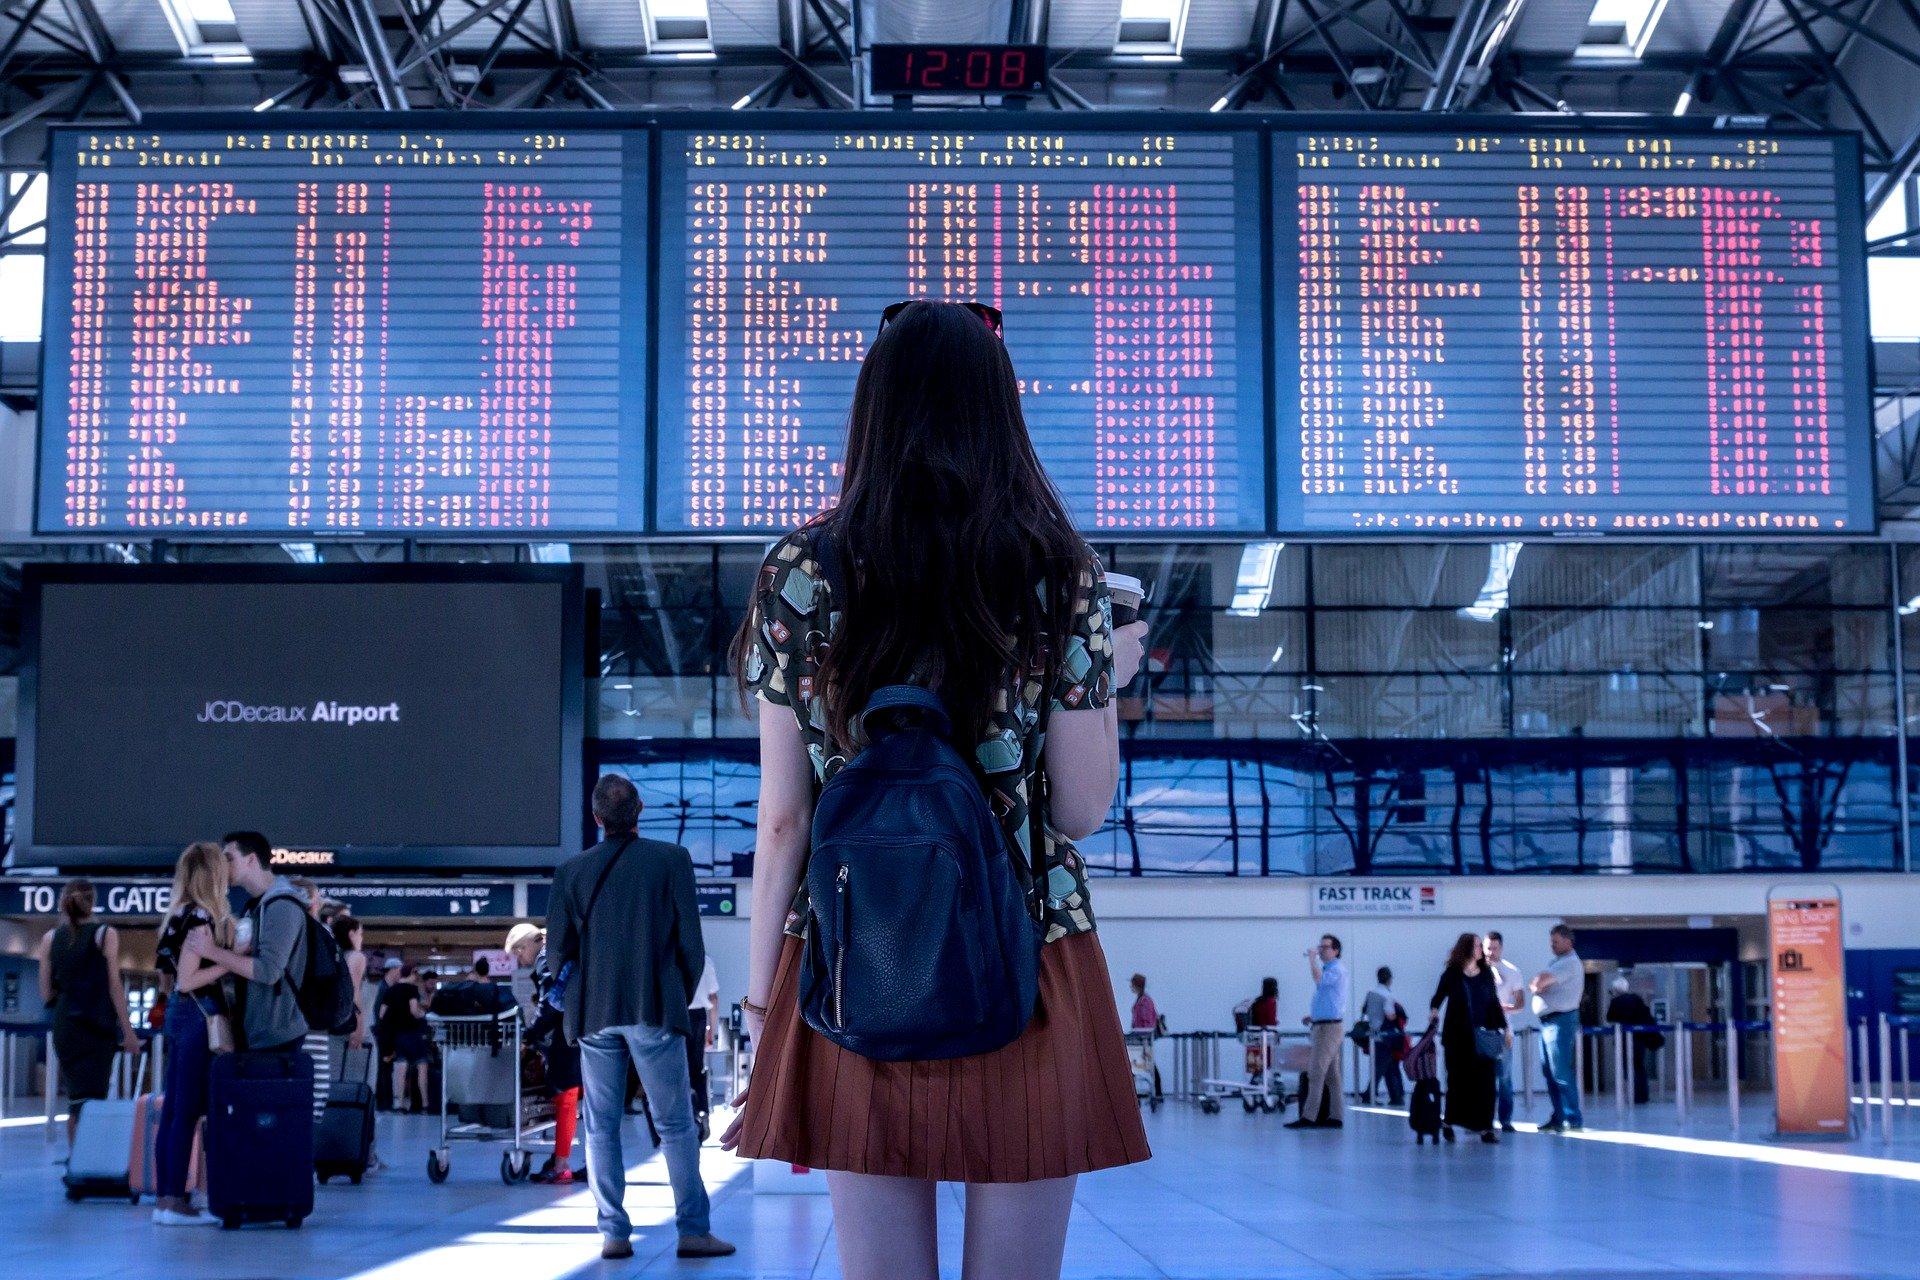 空港 日常生活 航大生活 フライト課程 座学課程